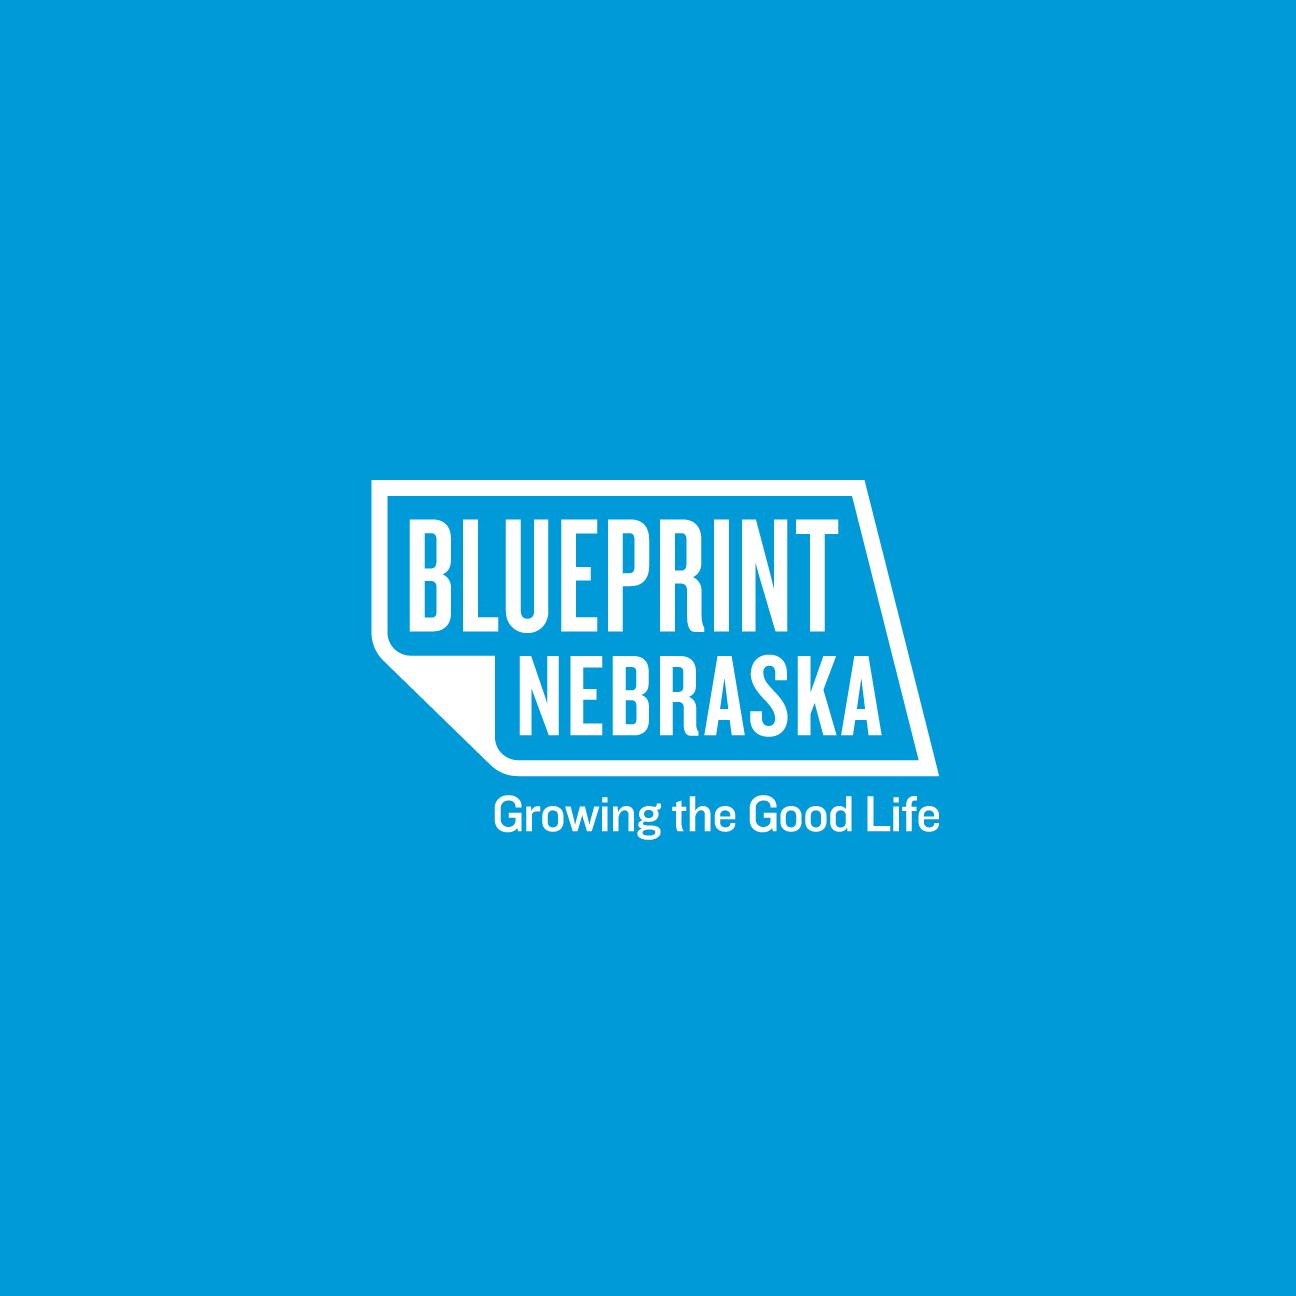 Blueprint Nebraska